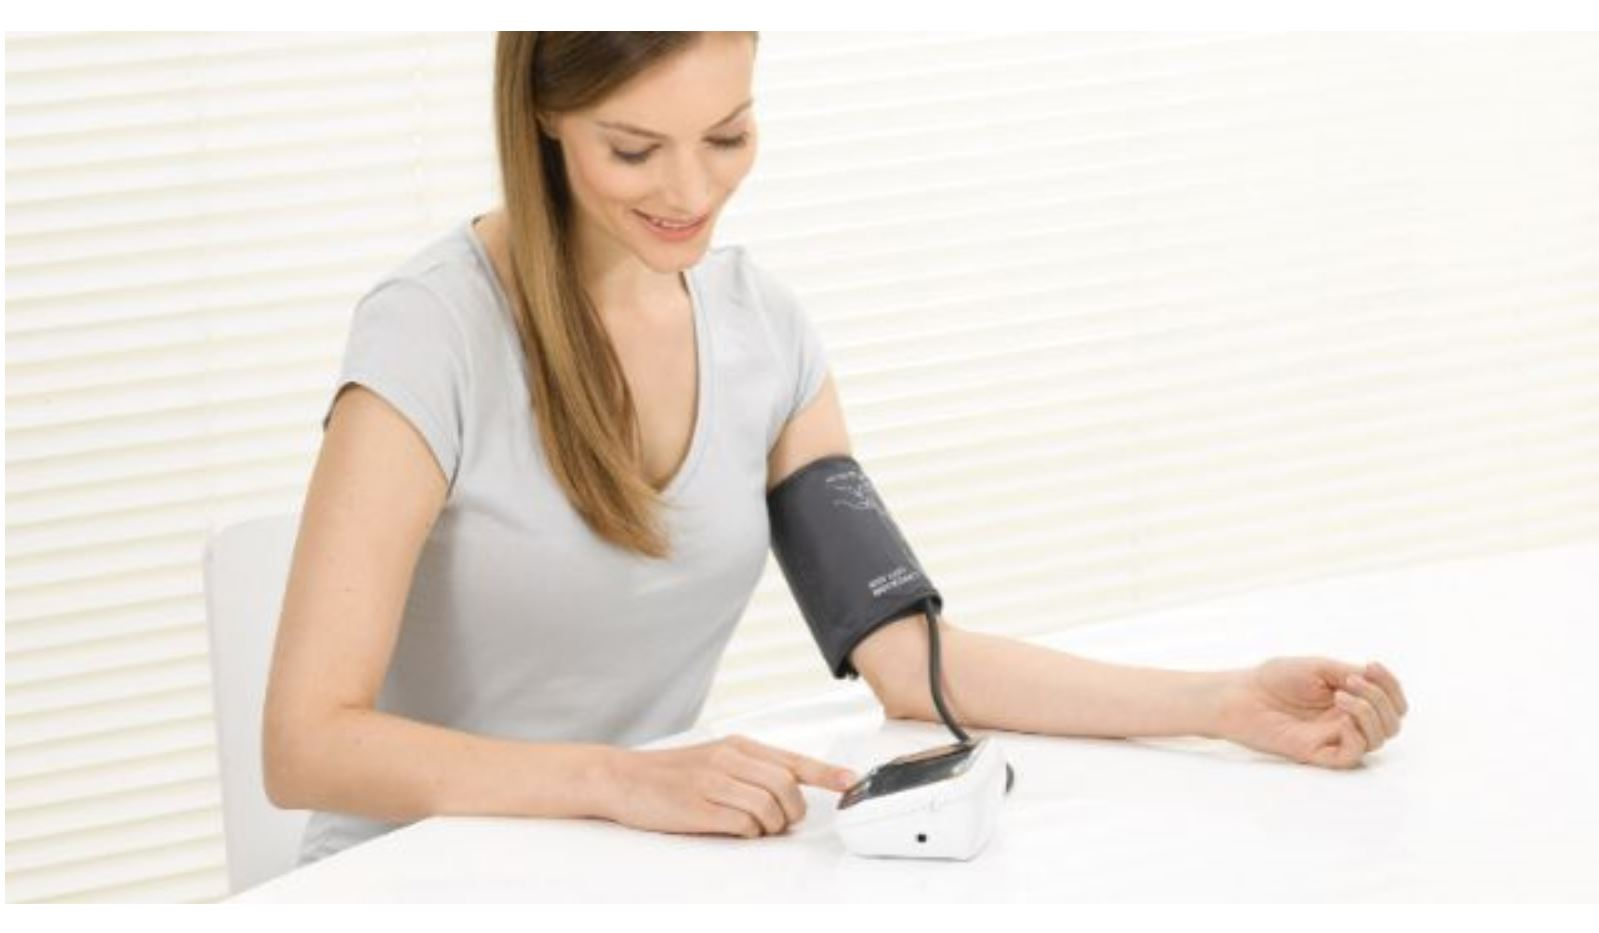 Máy đo huyết áp bắp tay Beurer BM40 (bao gồm adapter)